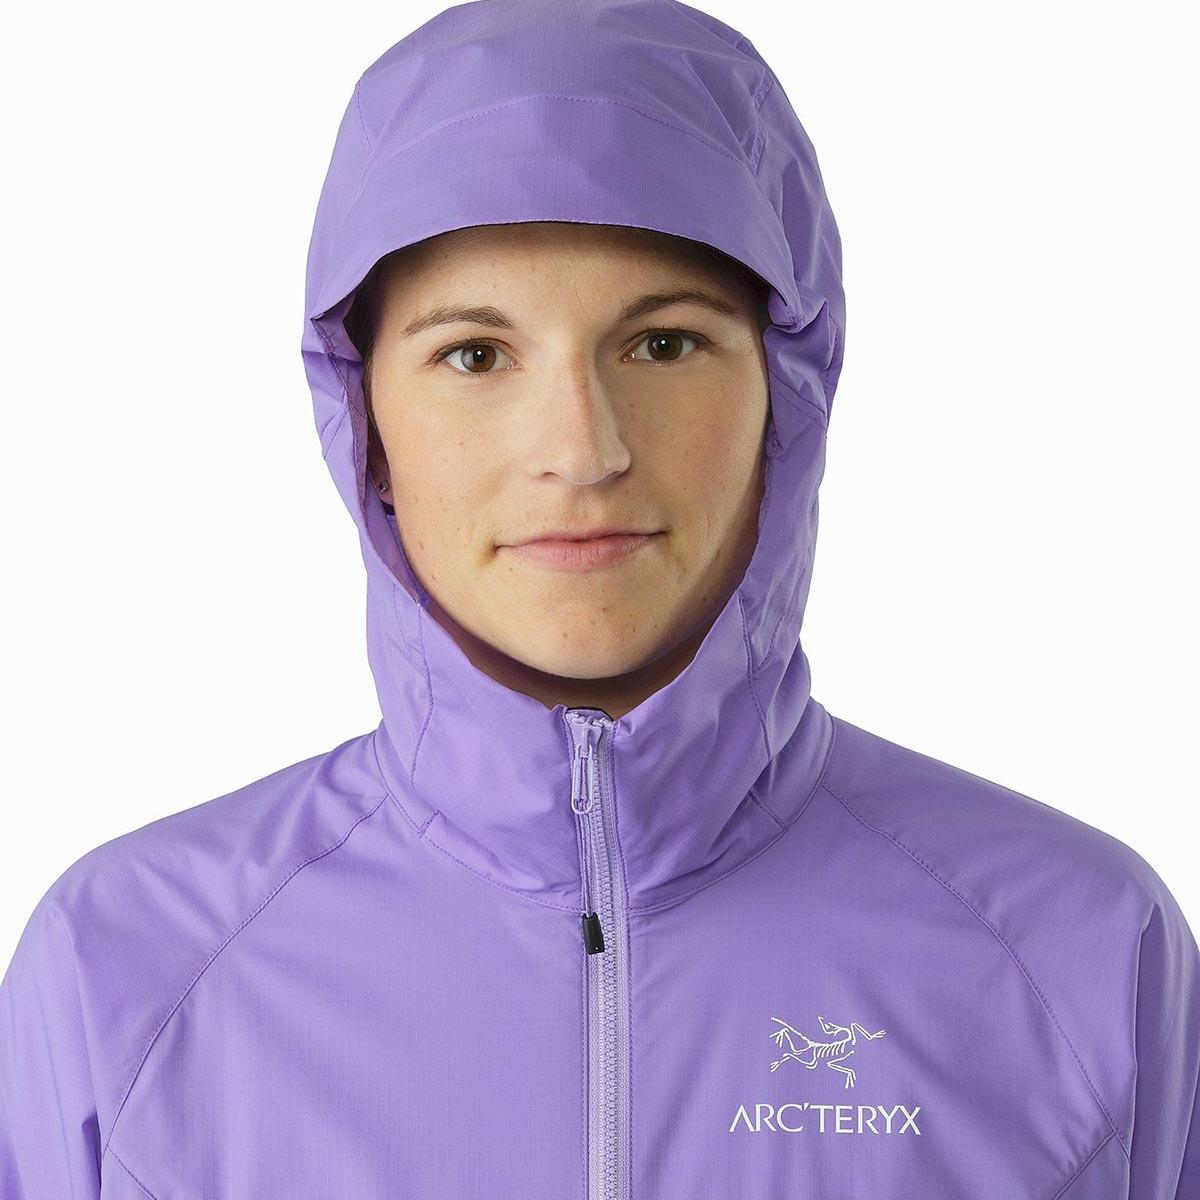 778b7e62096 Arc'teryx Squamish Hoody, women's, discontinued Fall 2018 colors ...